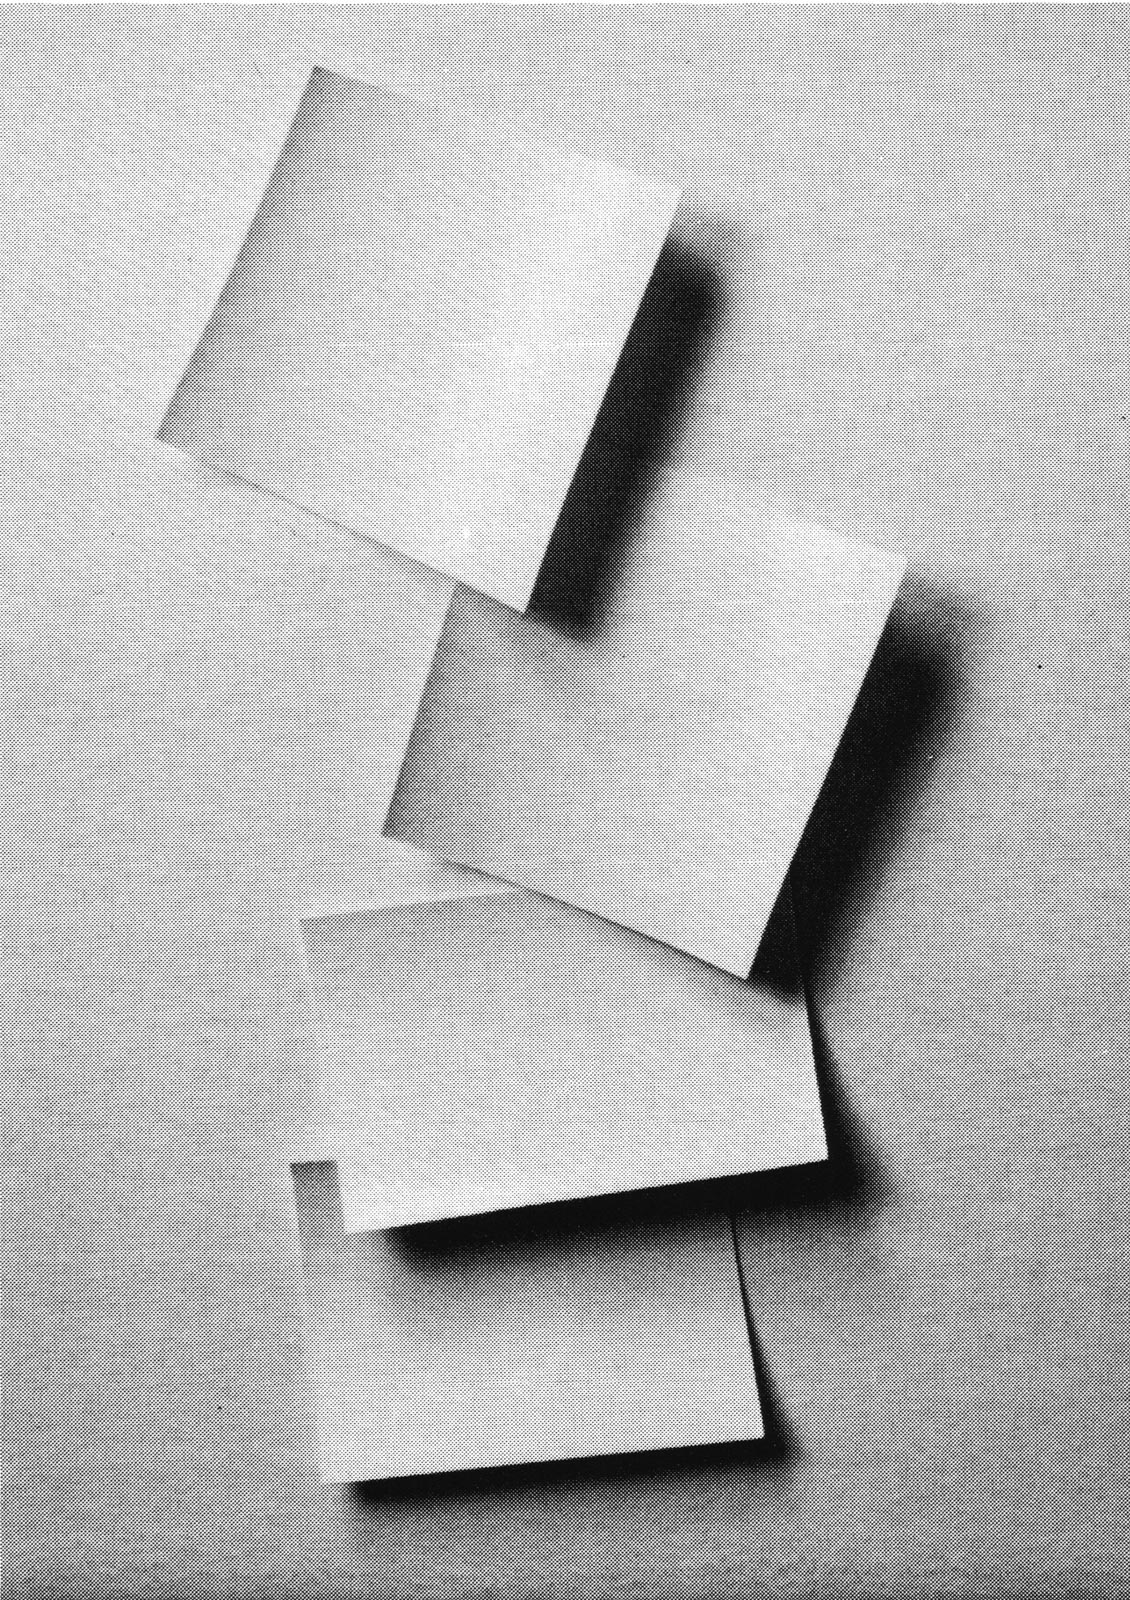 white on white, 2017, archival inkjet print, 155 x 110 cm, Edition 5